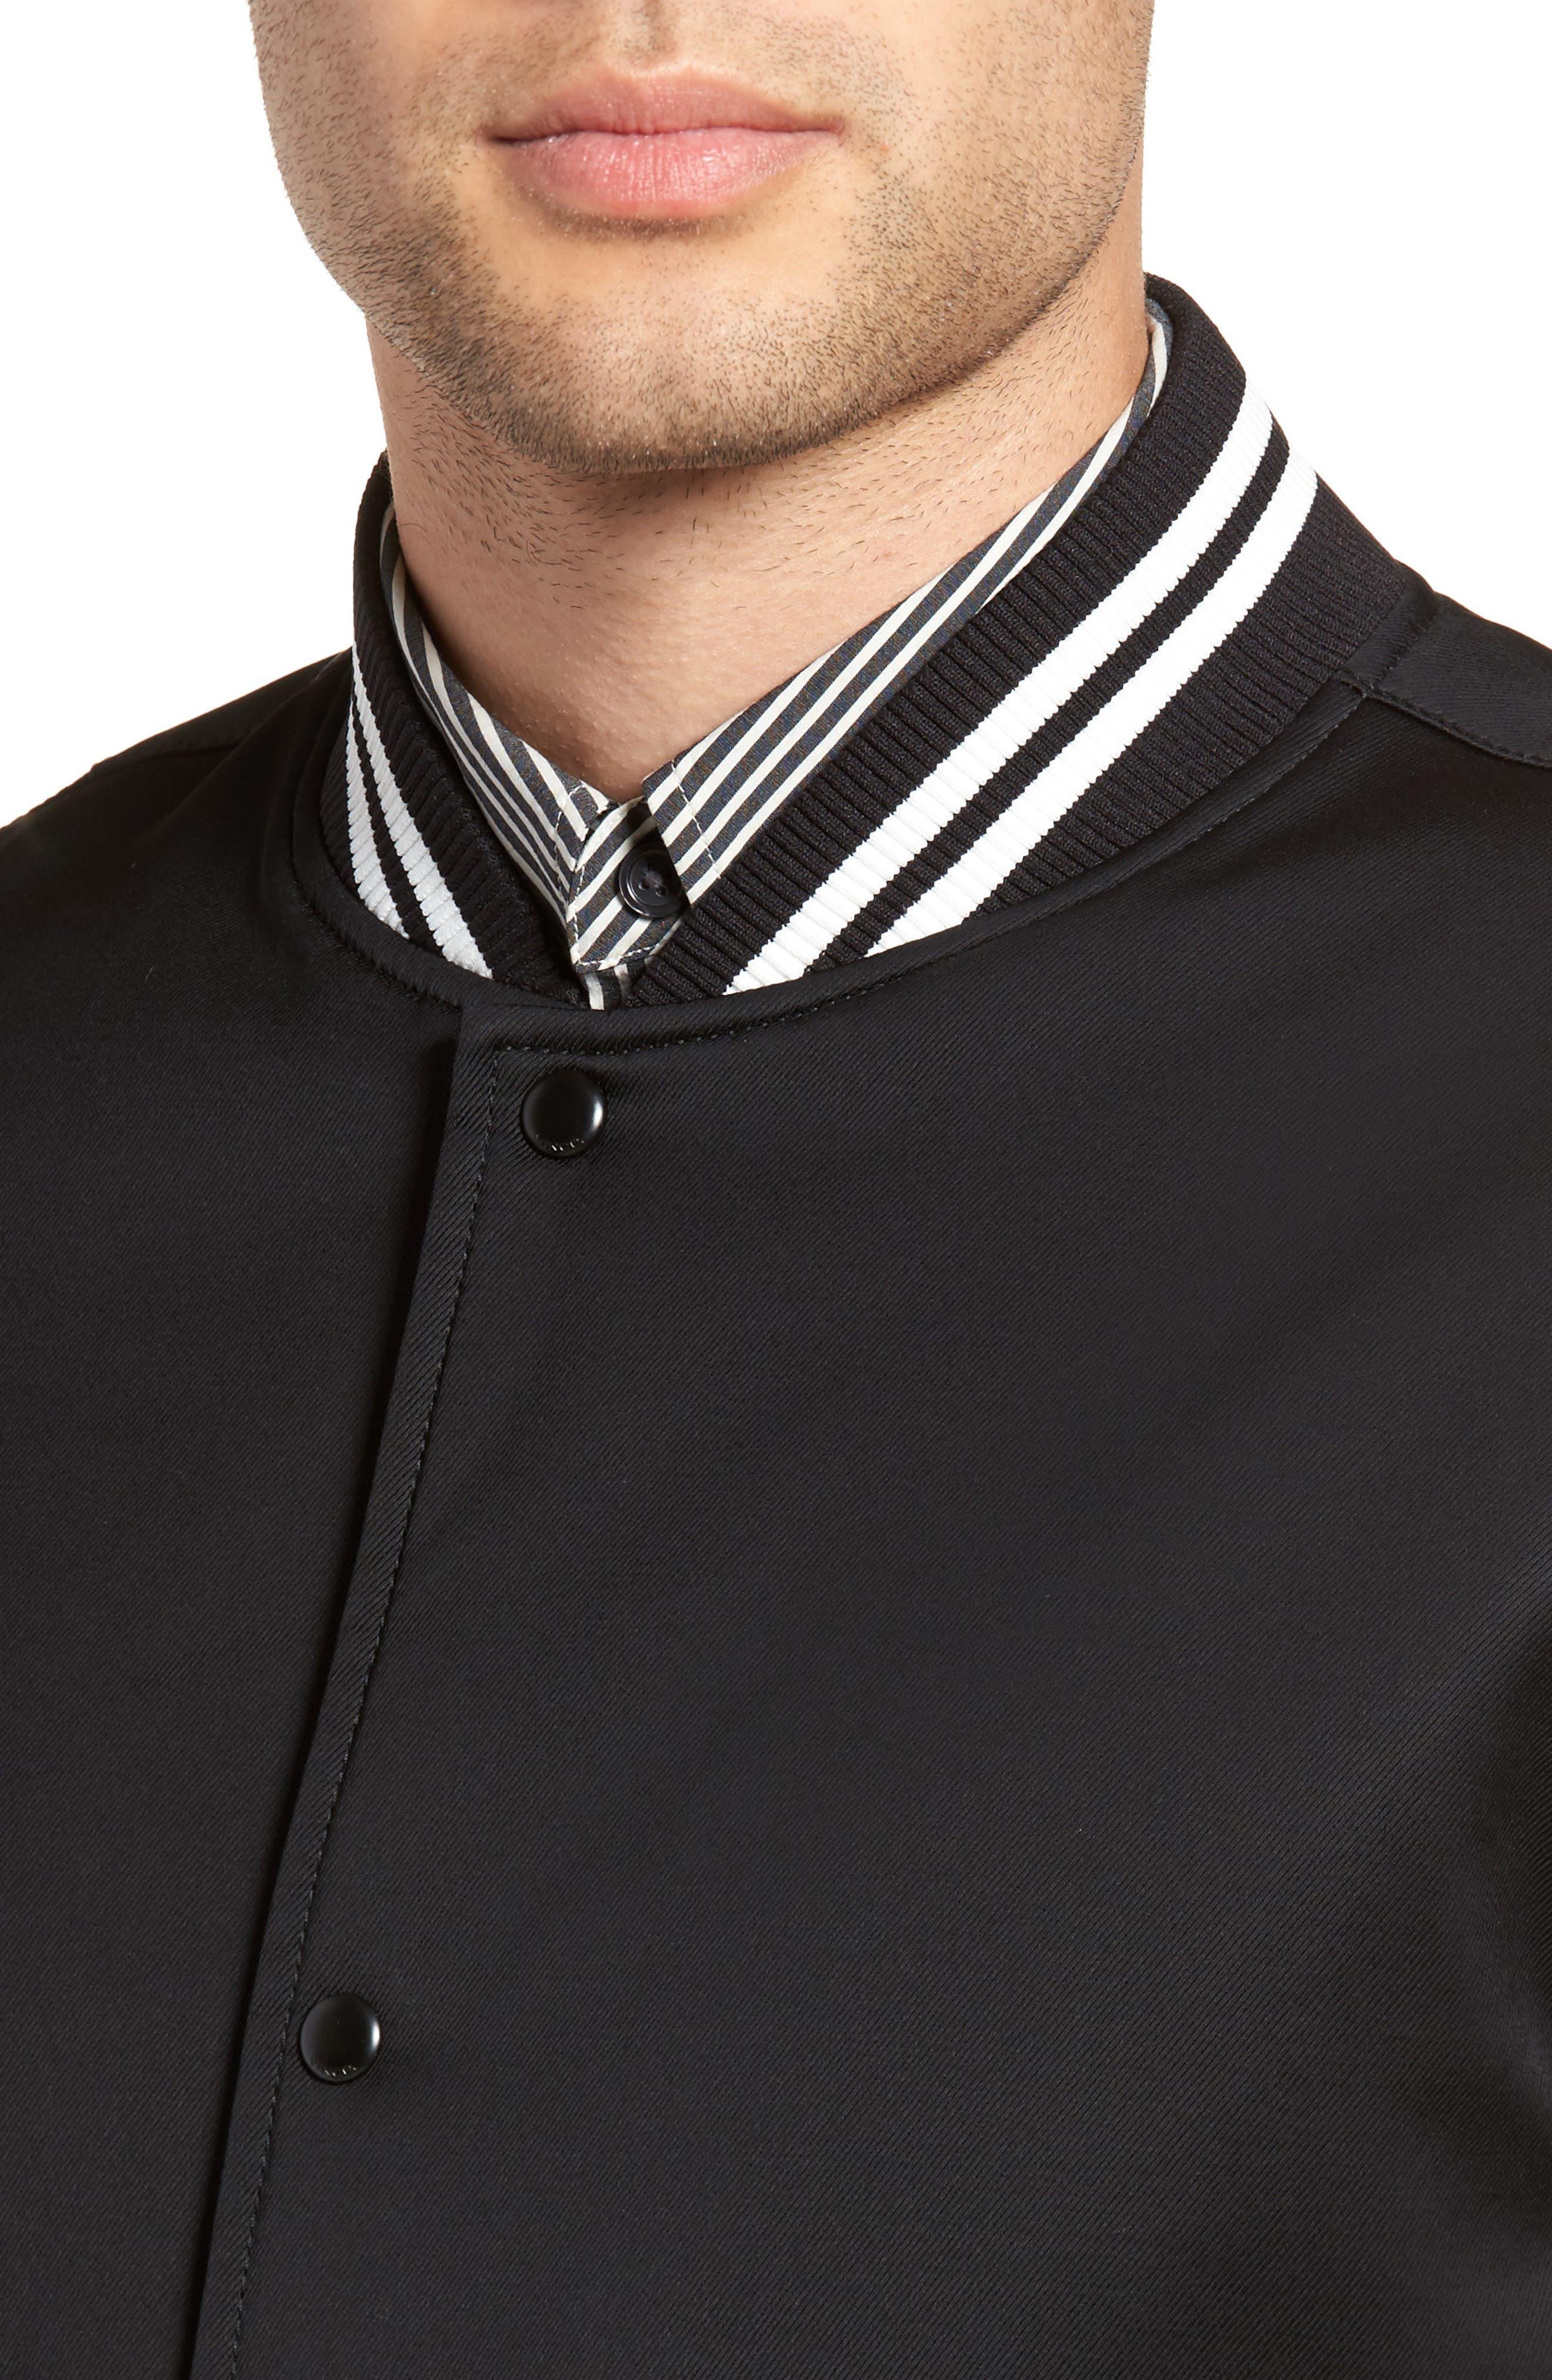 Varsity Jacket,                             Alternate thumbnail 4, color,                             001